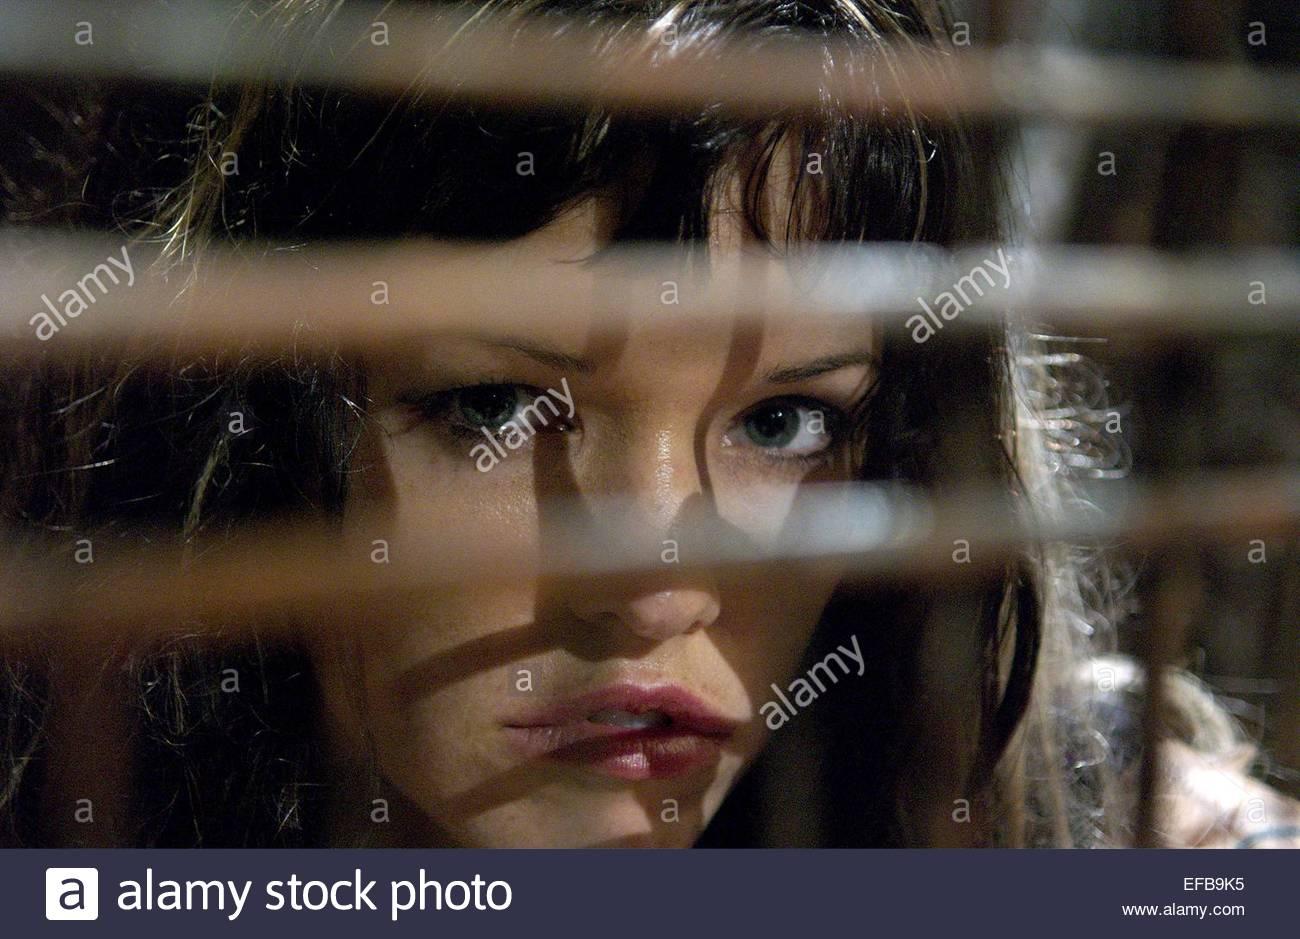 Maggie Smith (born 1934),Kate Jackson born October 29, 1948 (age 70) Porn video Abby Ryder Fortson,Chloe Annett (born 1971)